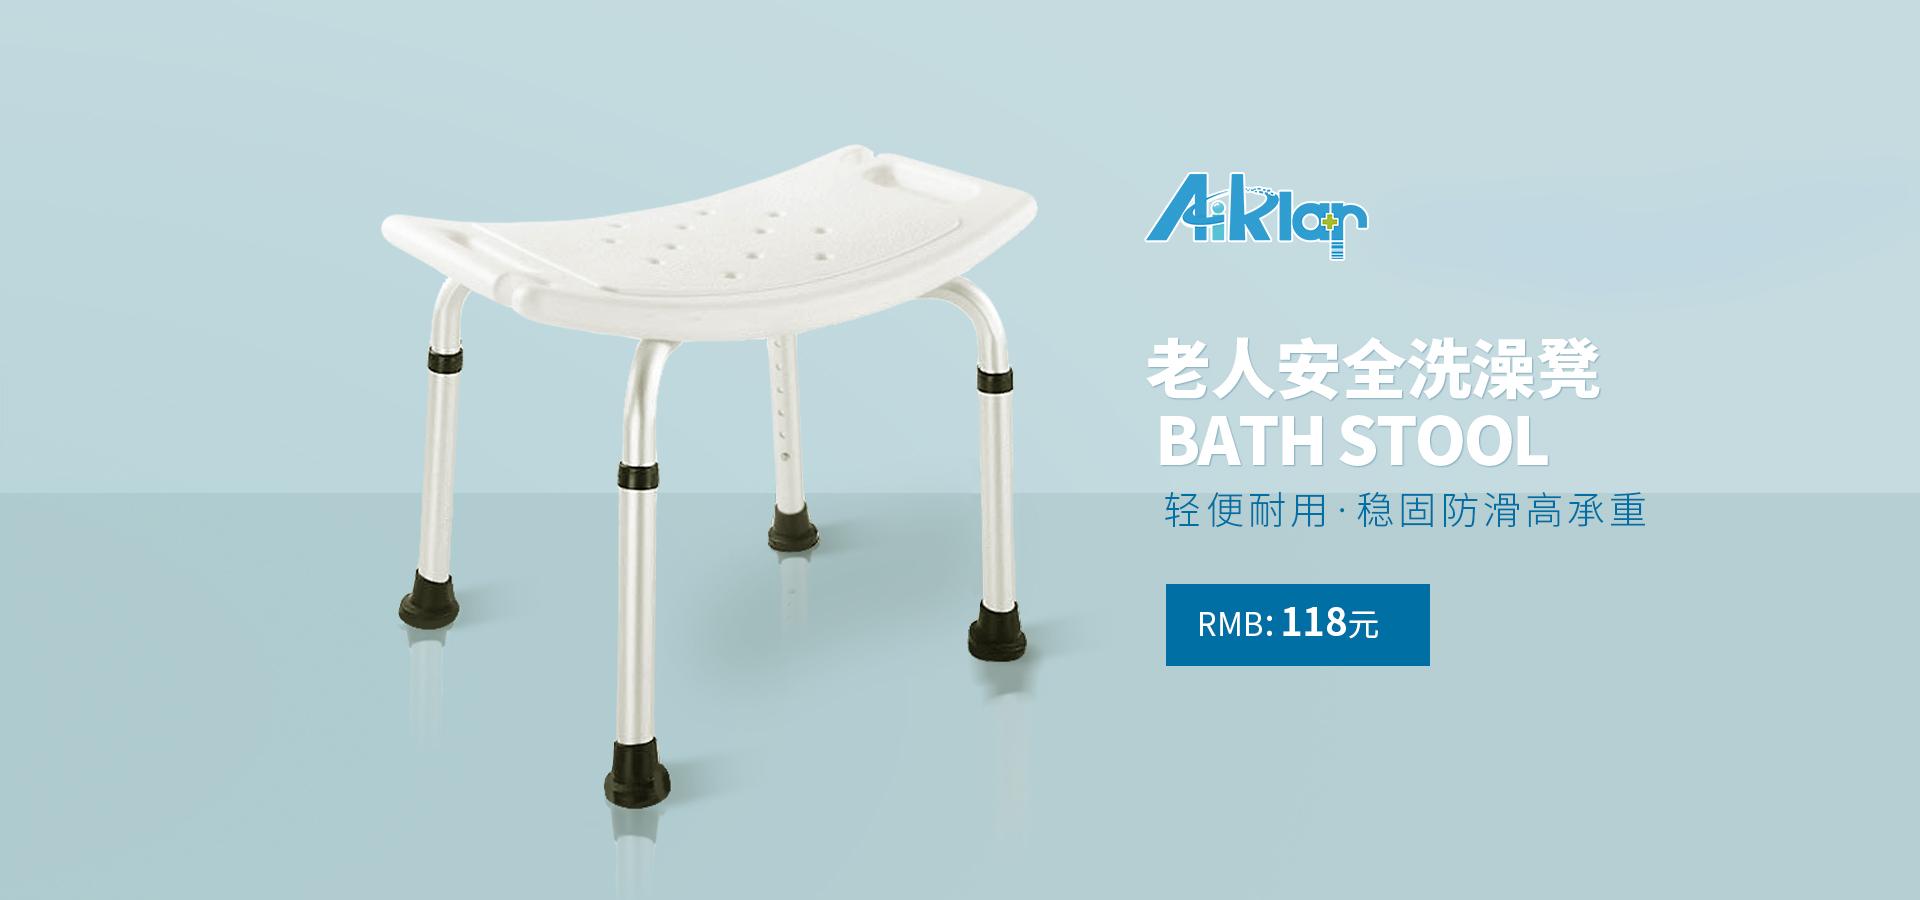 BZ1801A基础医疗老人用品 防滑洗澡辅助凳 老年辅助器辅助椅